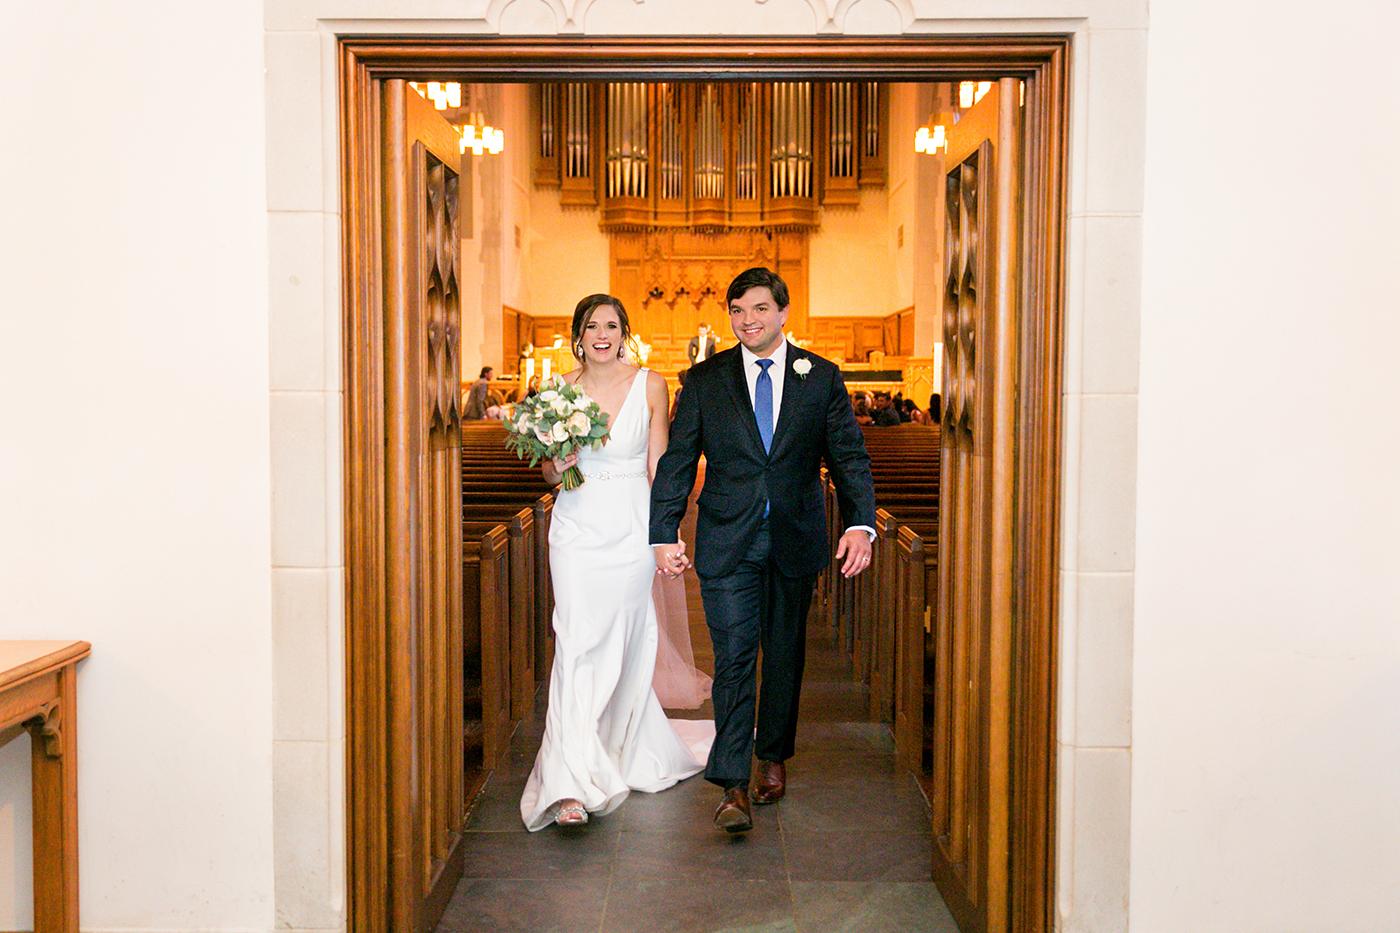 Wedding Planner Dallas TX - Allday Events - Highland Park - Marie Gabrielle Wedding - 243.jpg